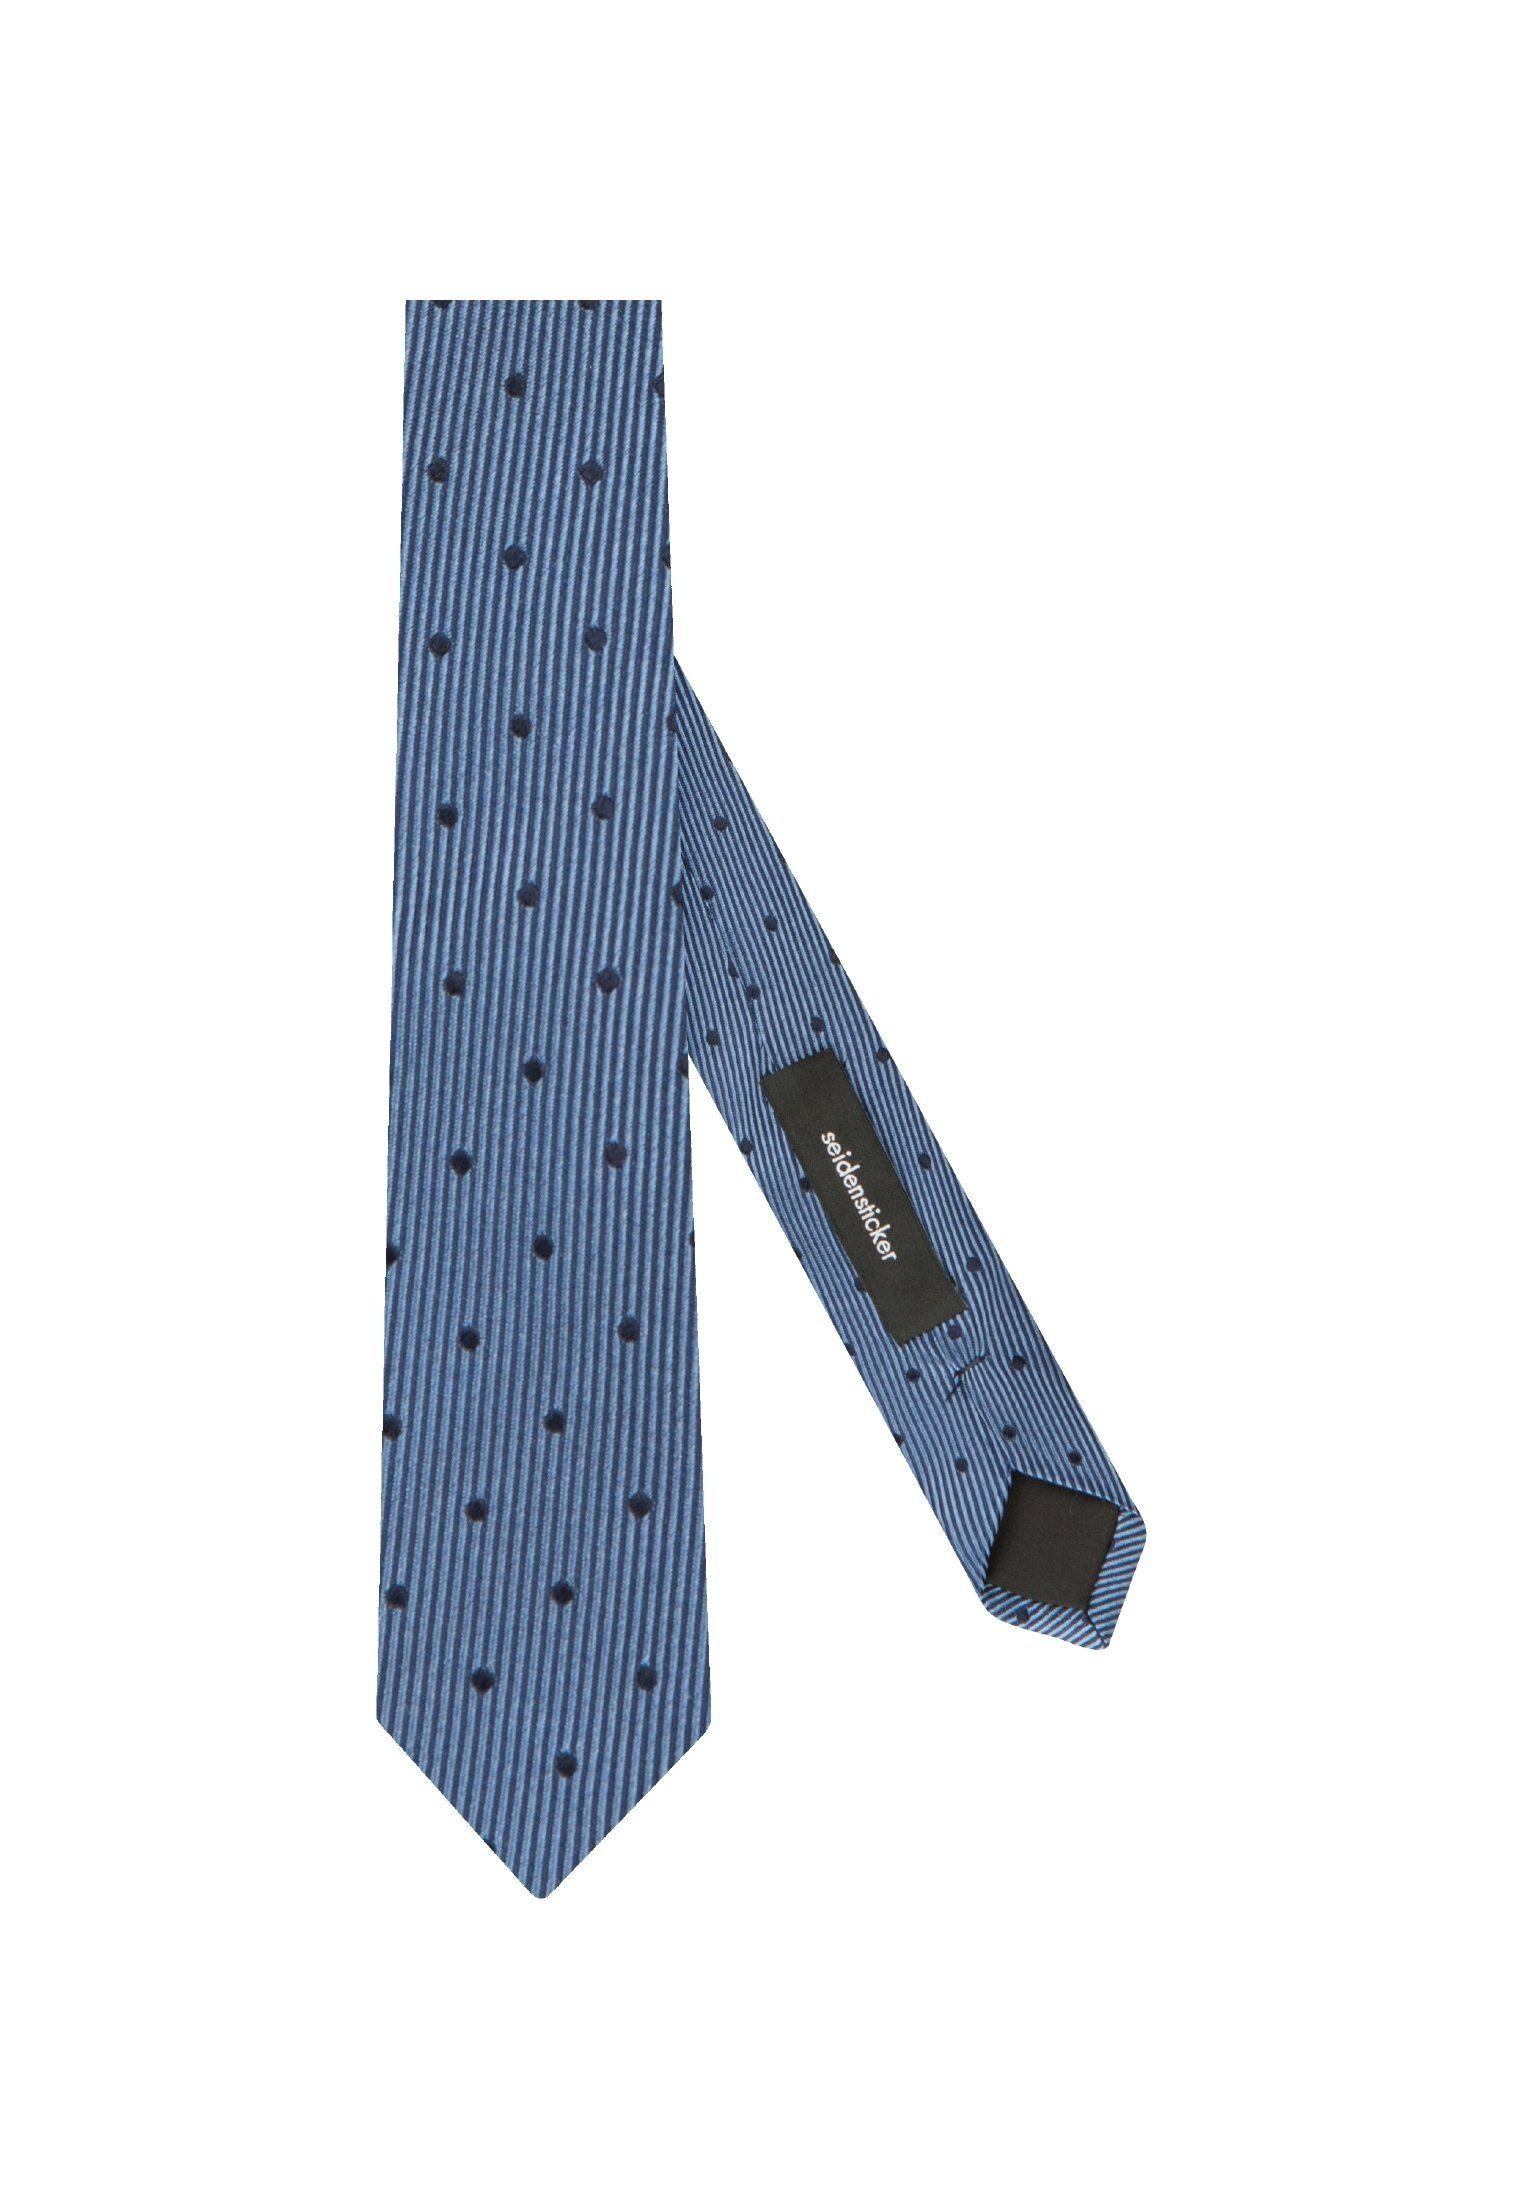 Seidensticker »schwarze »schwarze Rose«Breit7cmOnline Kaufen Seidensticker Krawatte Seidensticker Krawatte »schwarze Rose«Breit7cmOnline Krawatte Rose«Breit7cmOnline Kaufen txohCsQrdB